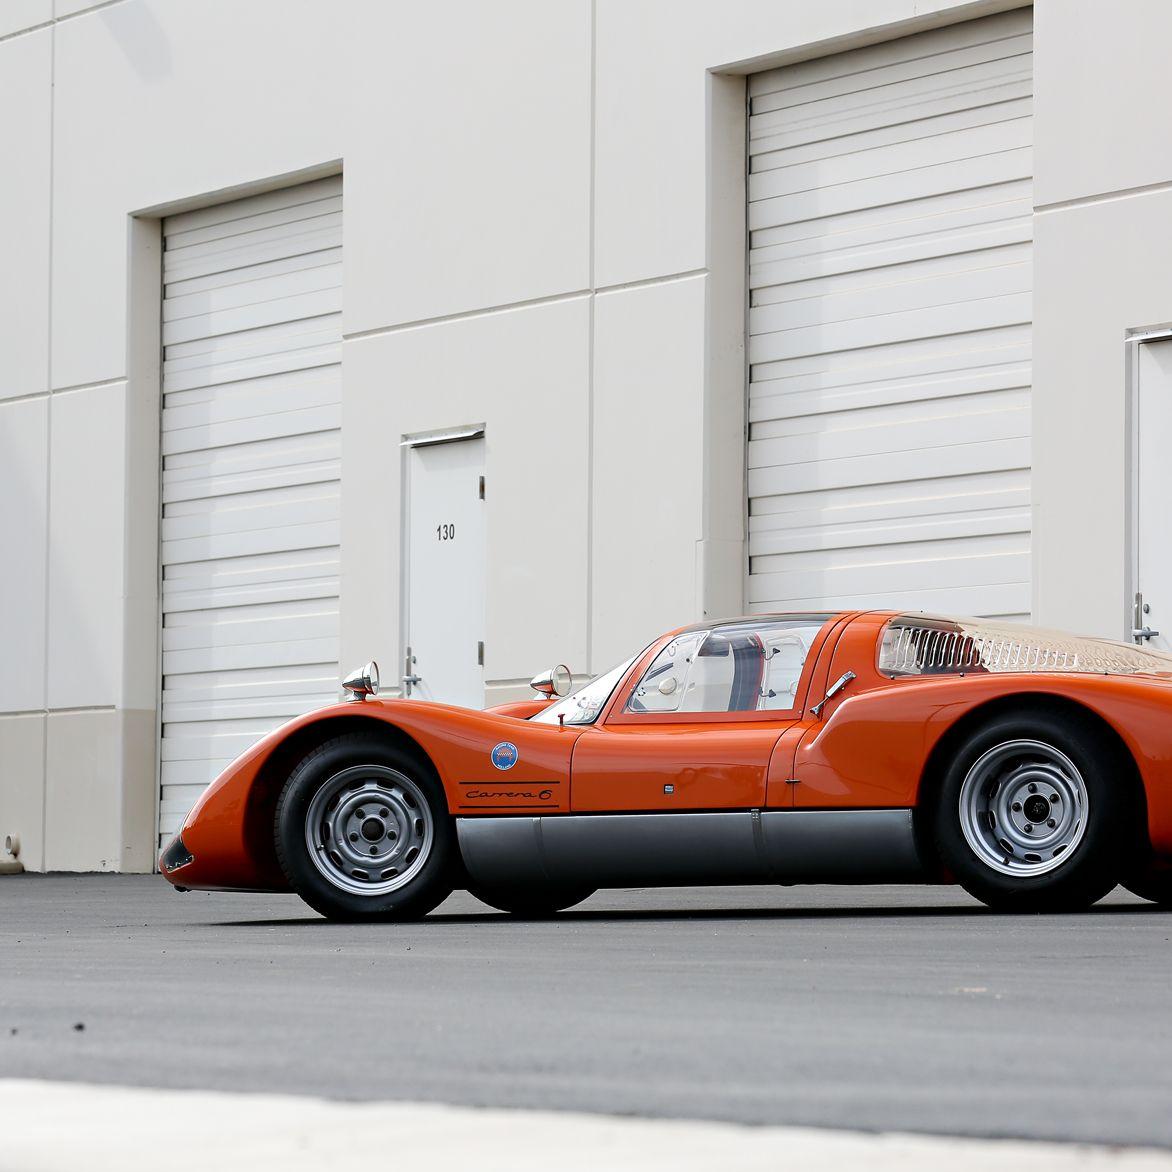 1966 Porsche 906-134 Carrera 6